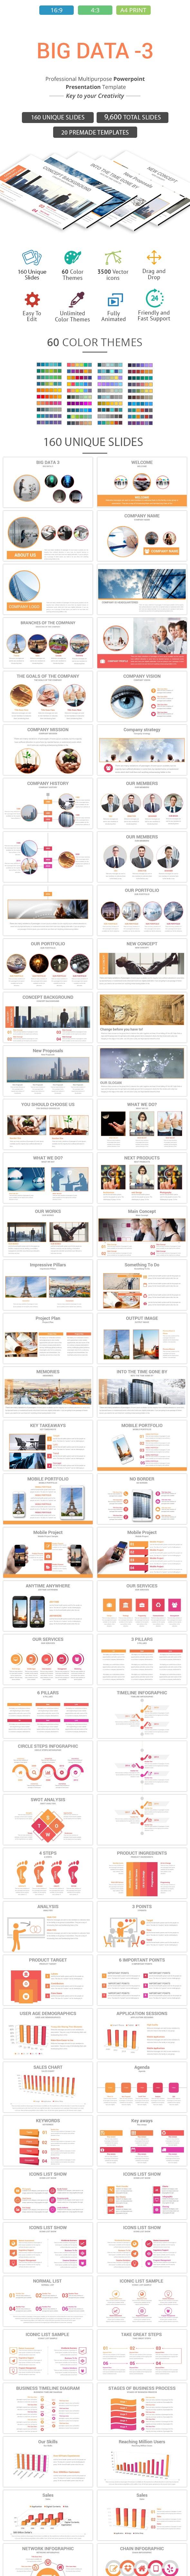 Big Data 3 PowerPoint Presentation Template - Business PowerPoint Templates